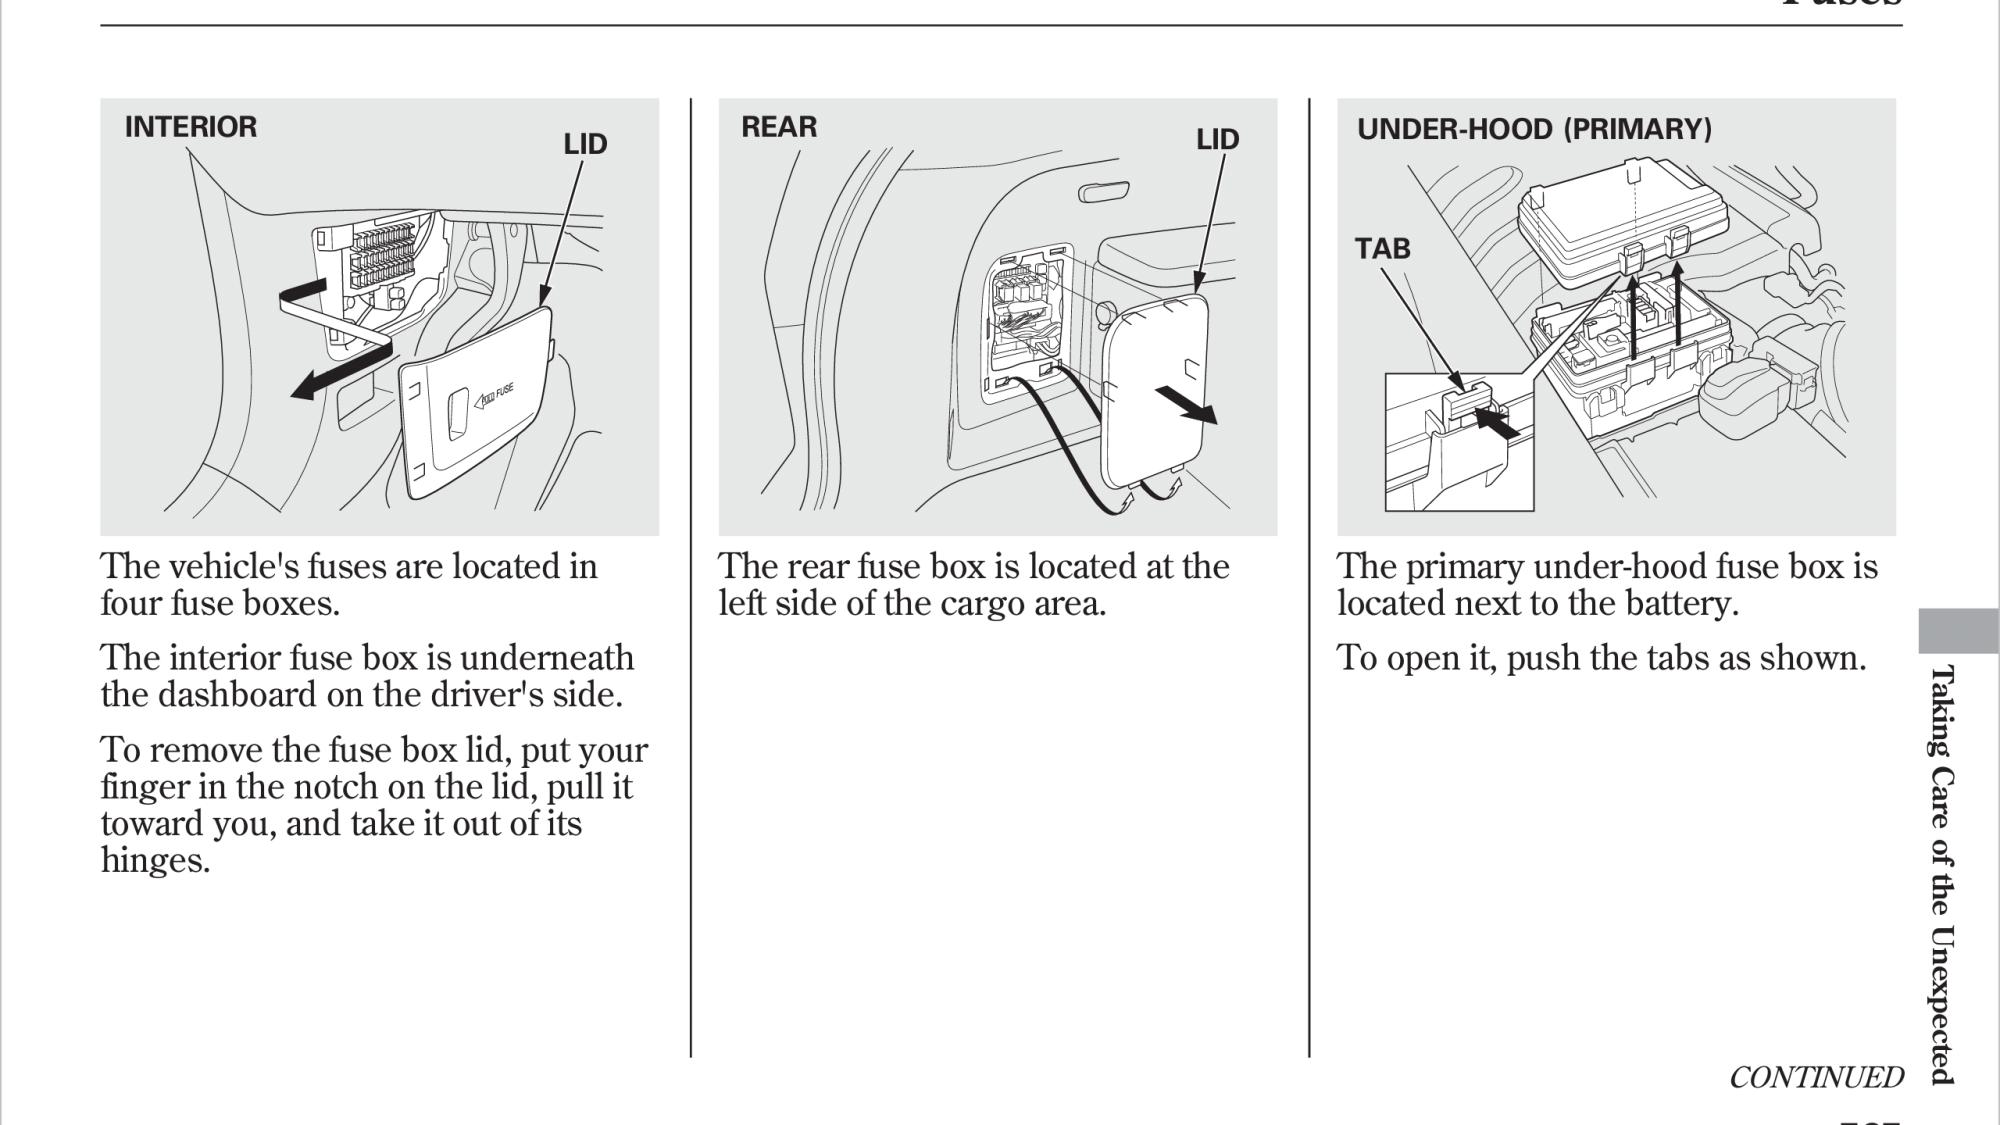 hight resolution of fuse box tabs wiring diagramsfuse box tabs 7 9 danishfashion mode de u2022fuse box